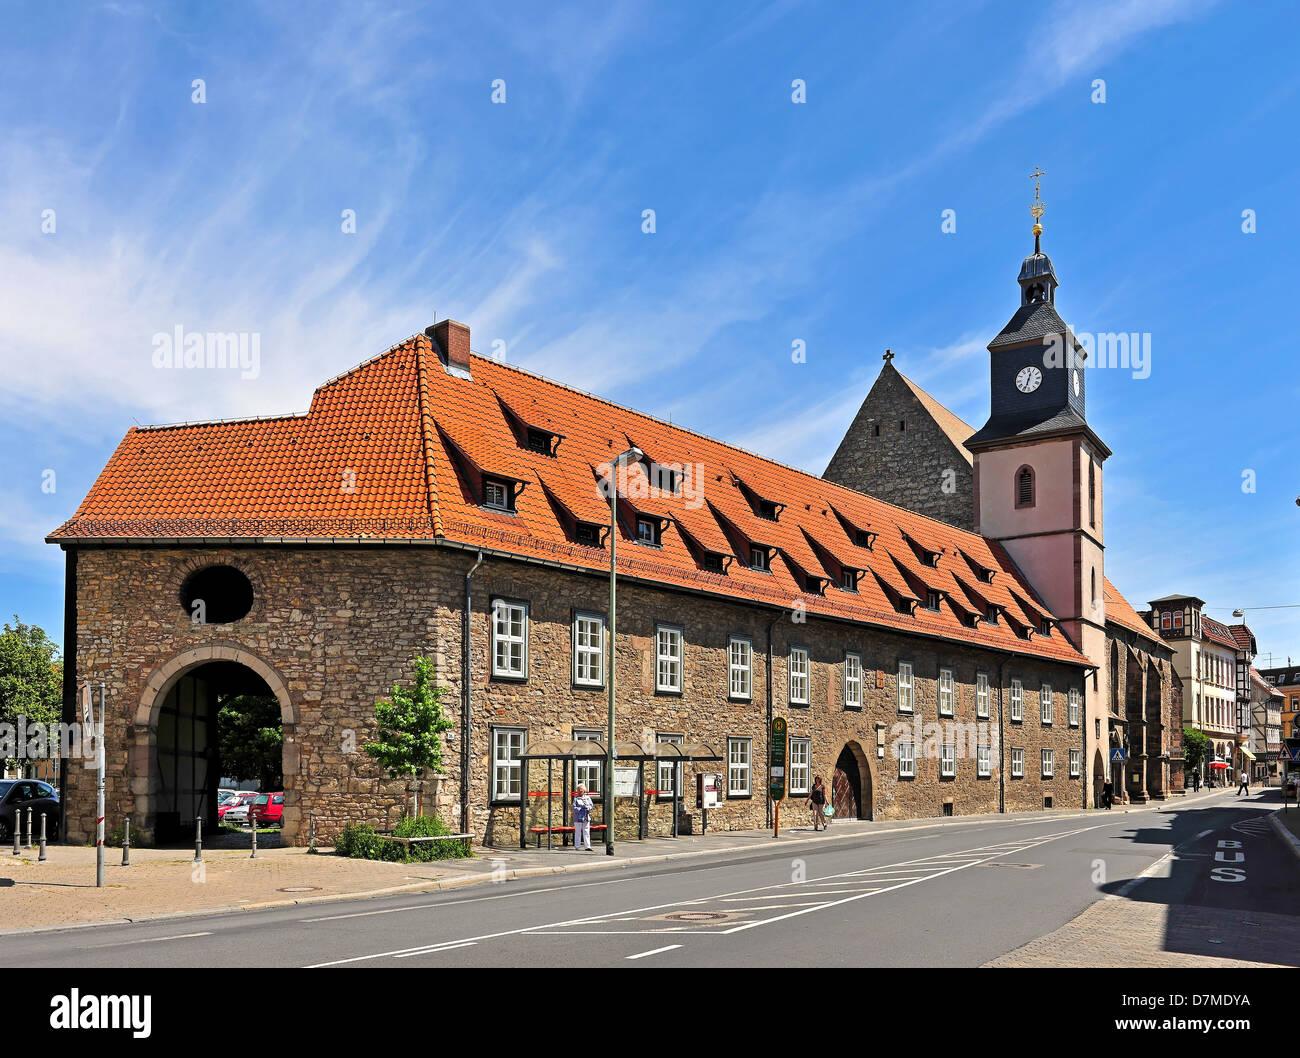 The Protestant Lutheran church St. Marien in Göttingen - Stock Image